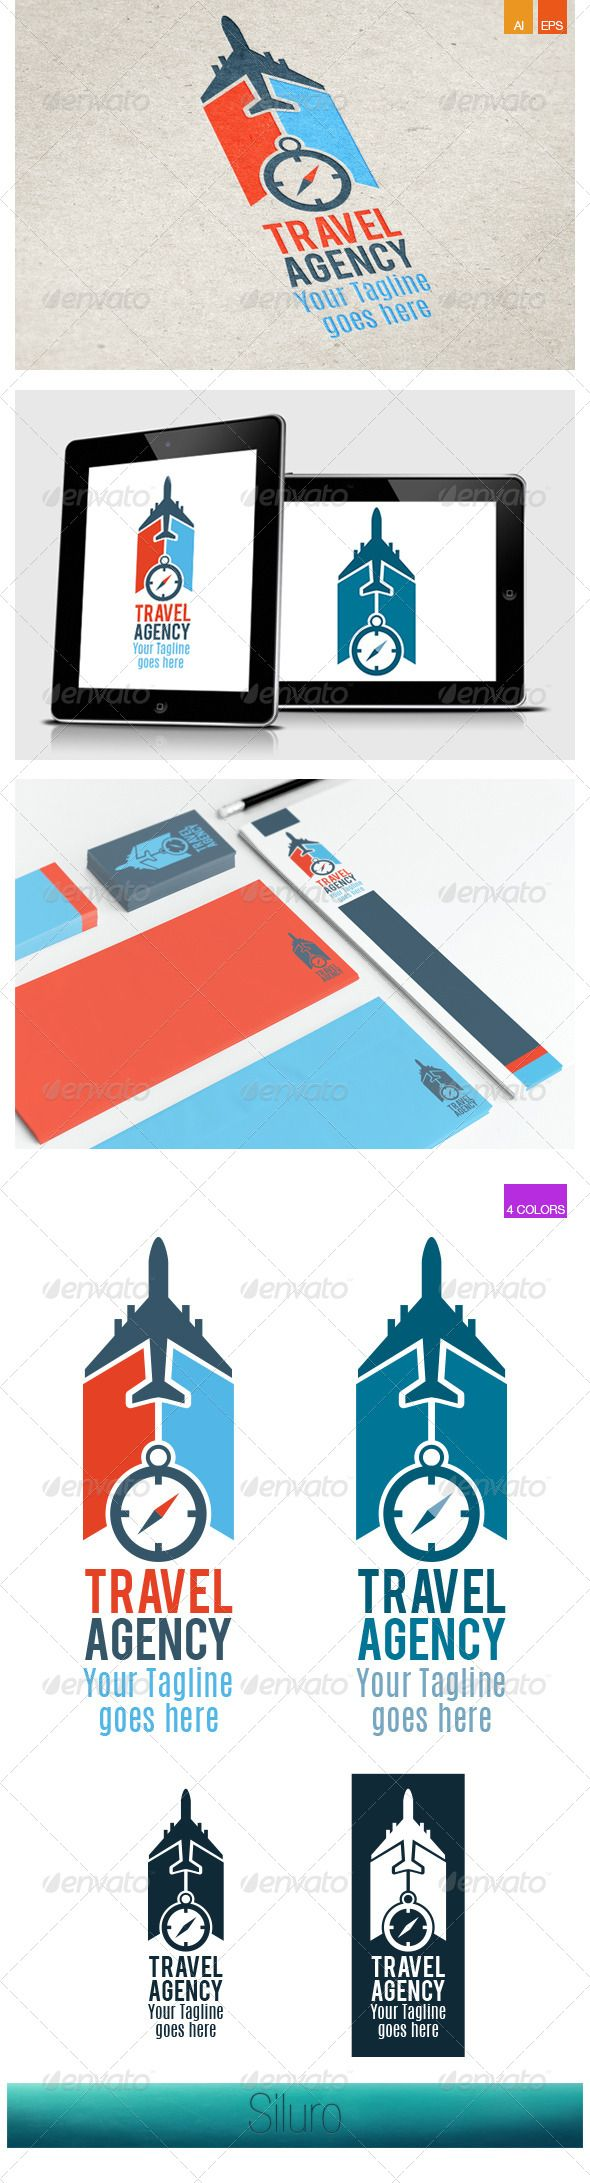 Travel Agency V1 Logo #graphicriver